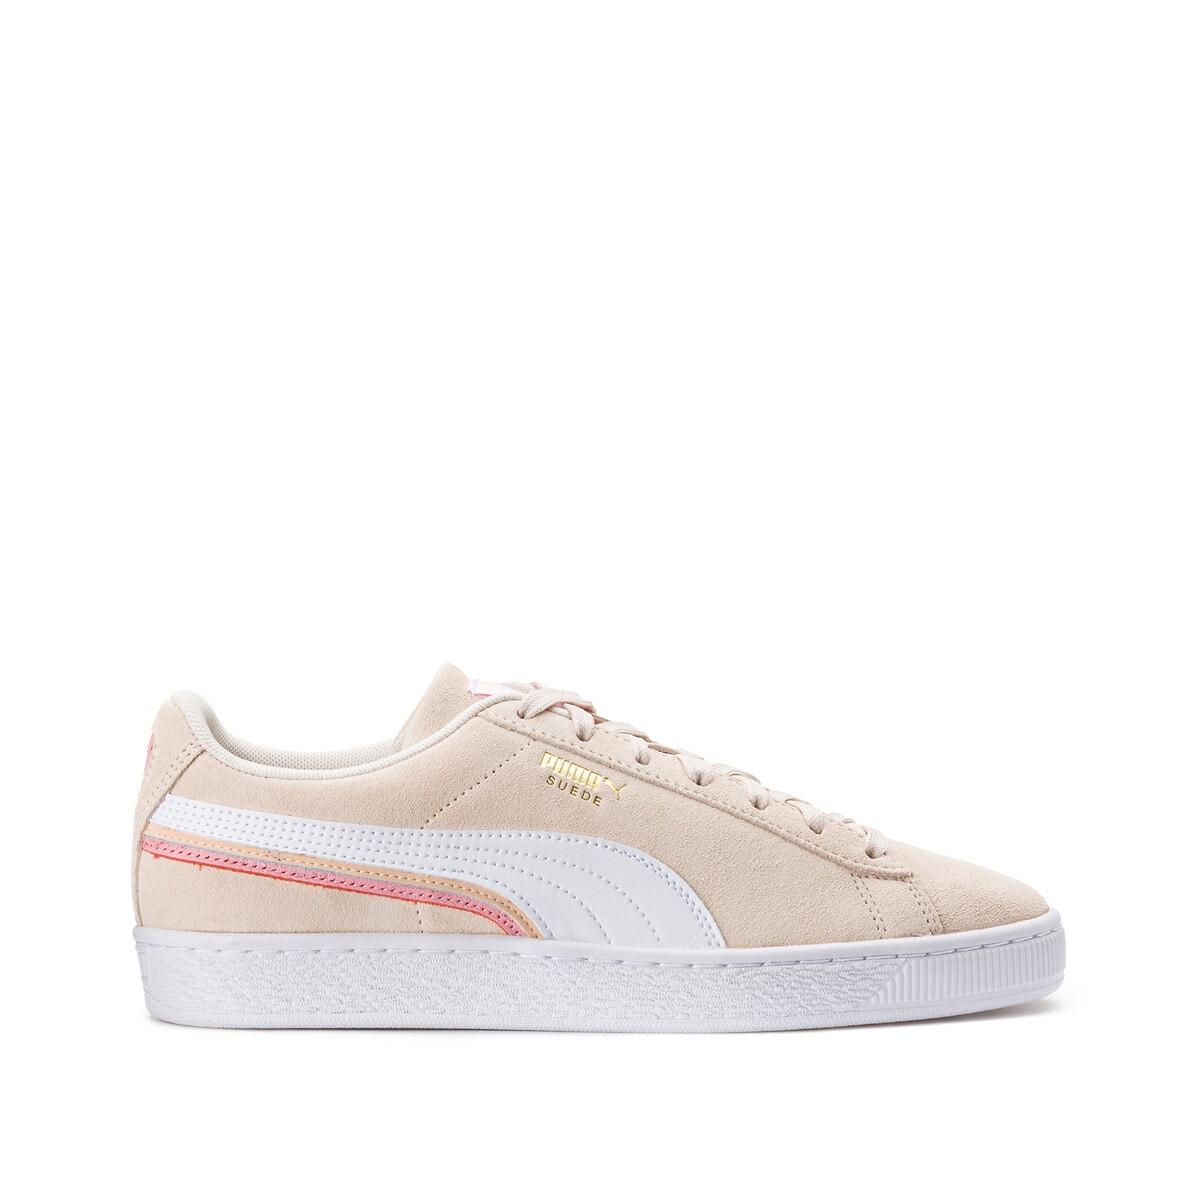 Chaussures puma femme roseLa Redoute